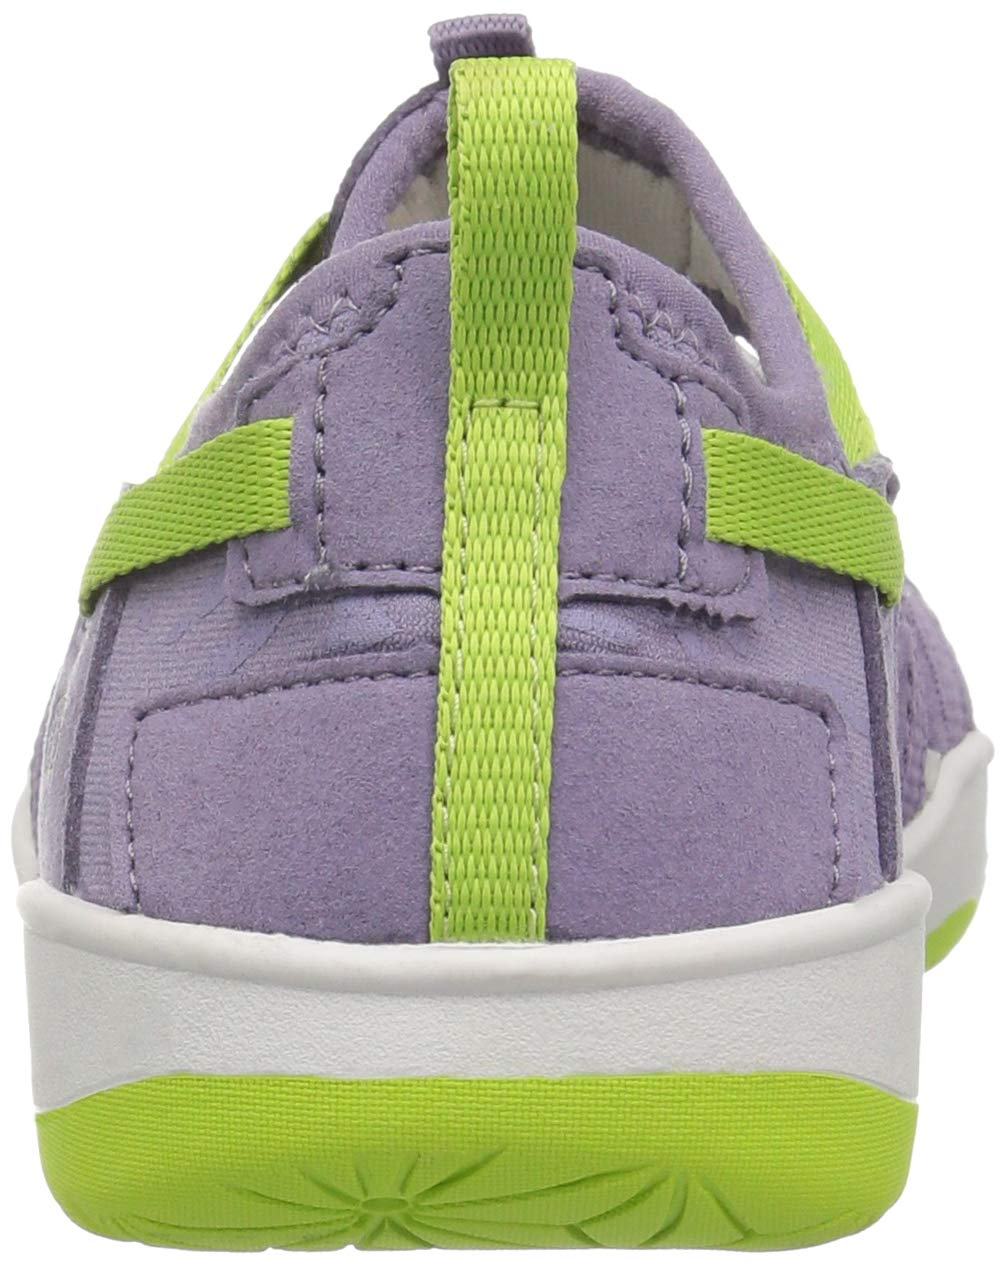 KEEN Unisex Moxie Sandal, Purple SAGE/Greenery, 6 M US Big Kid by KEEN (Image #2)